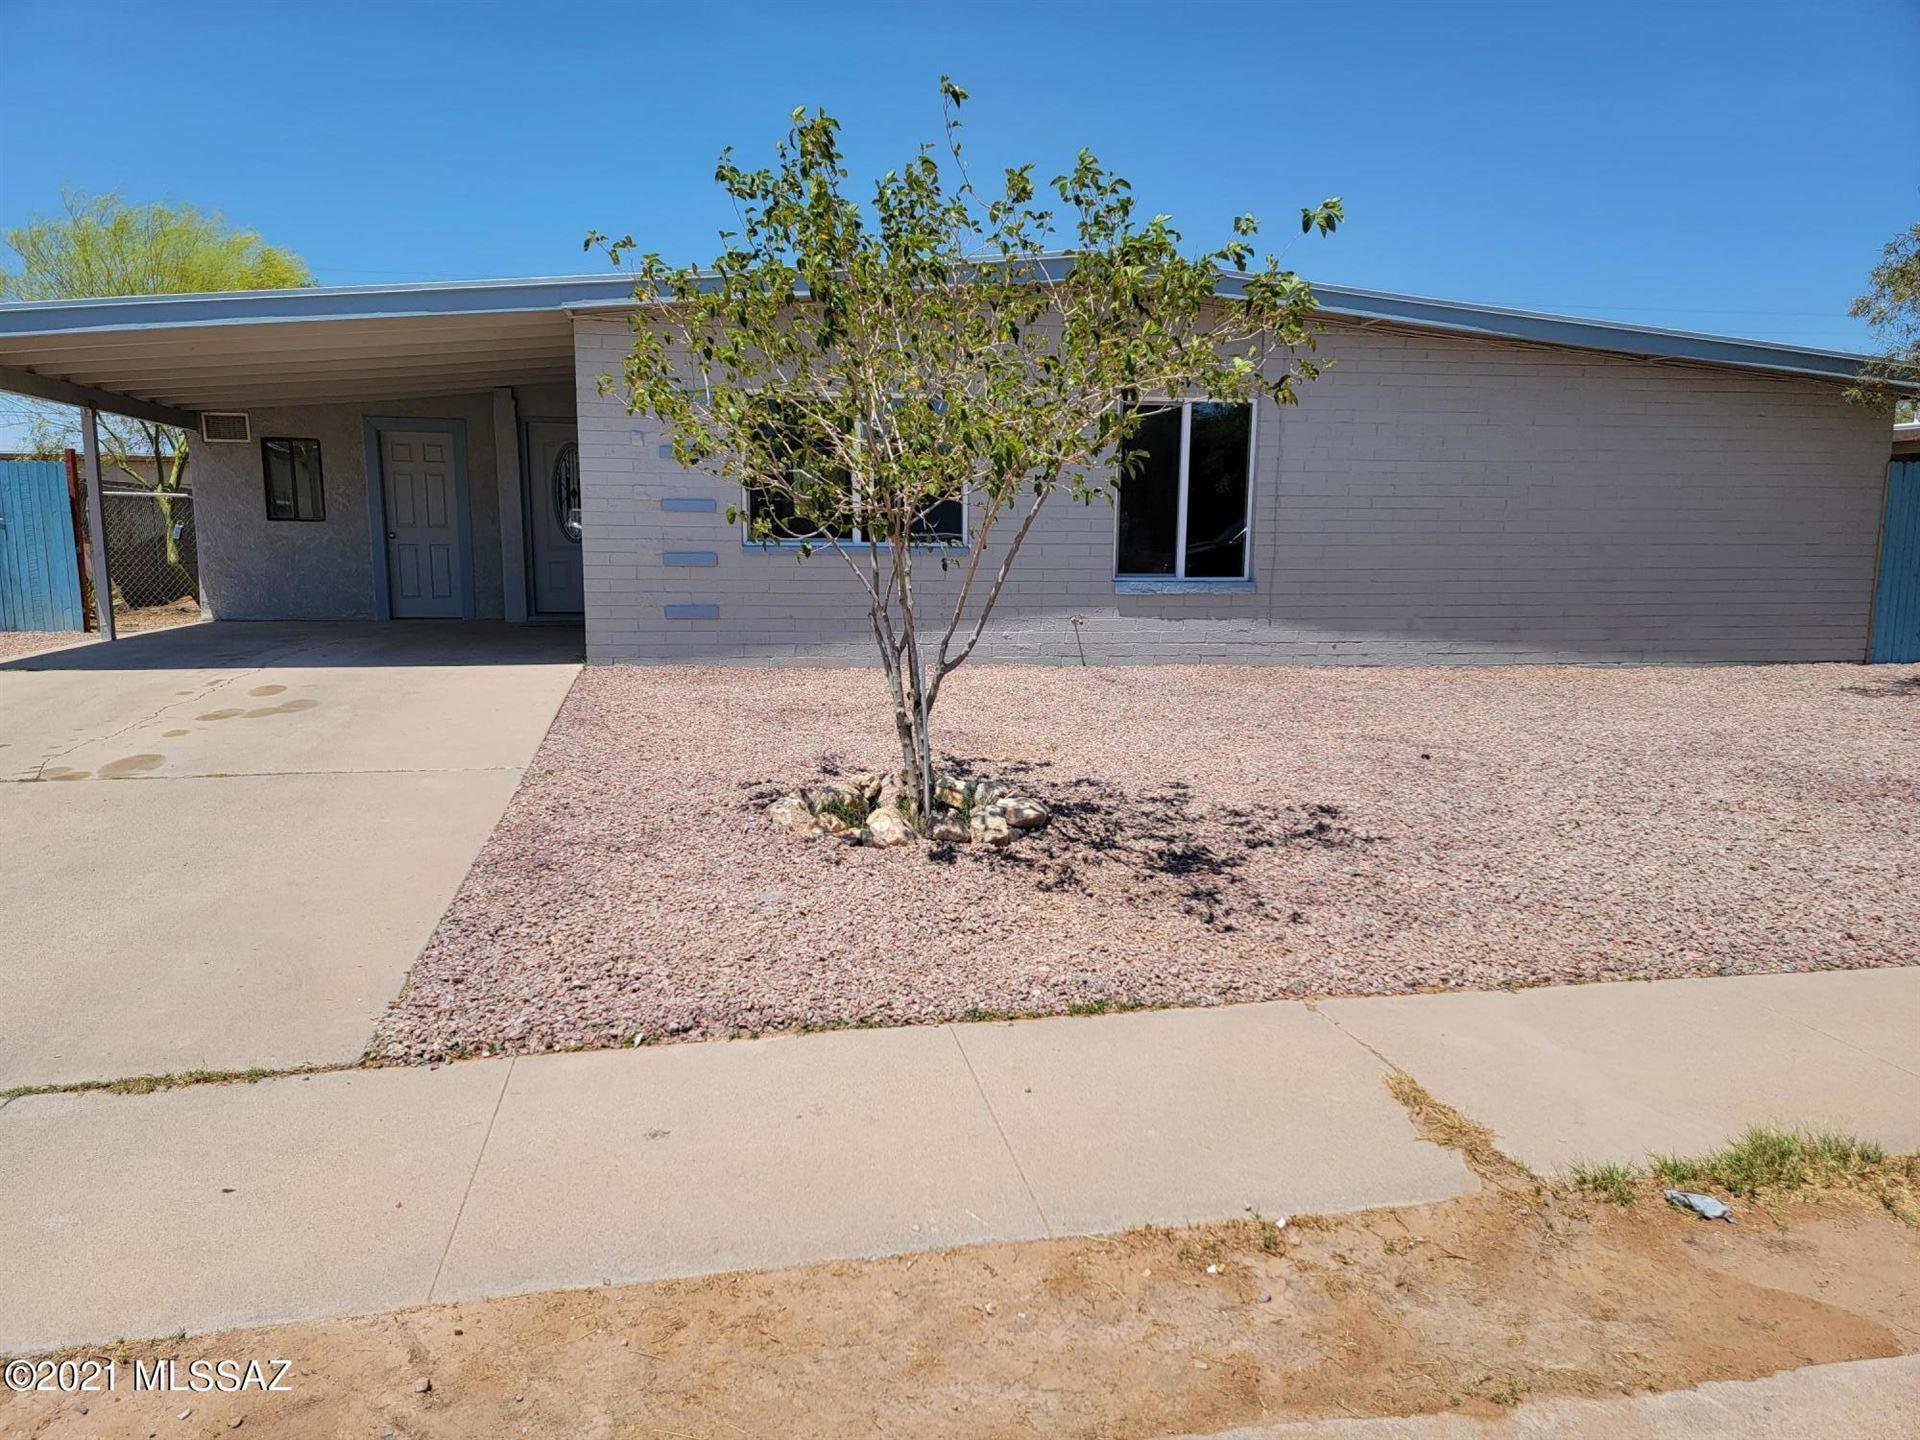 402 W Calle Margarita, Tucson, AZ 85706 - MLS#: 22114513